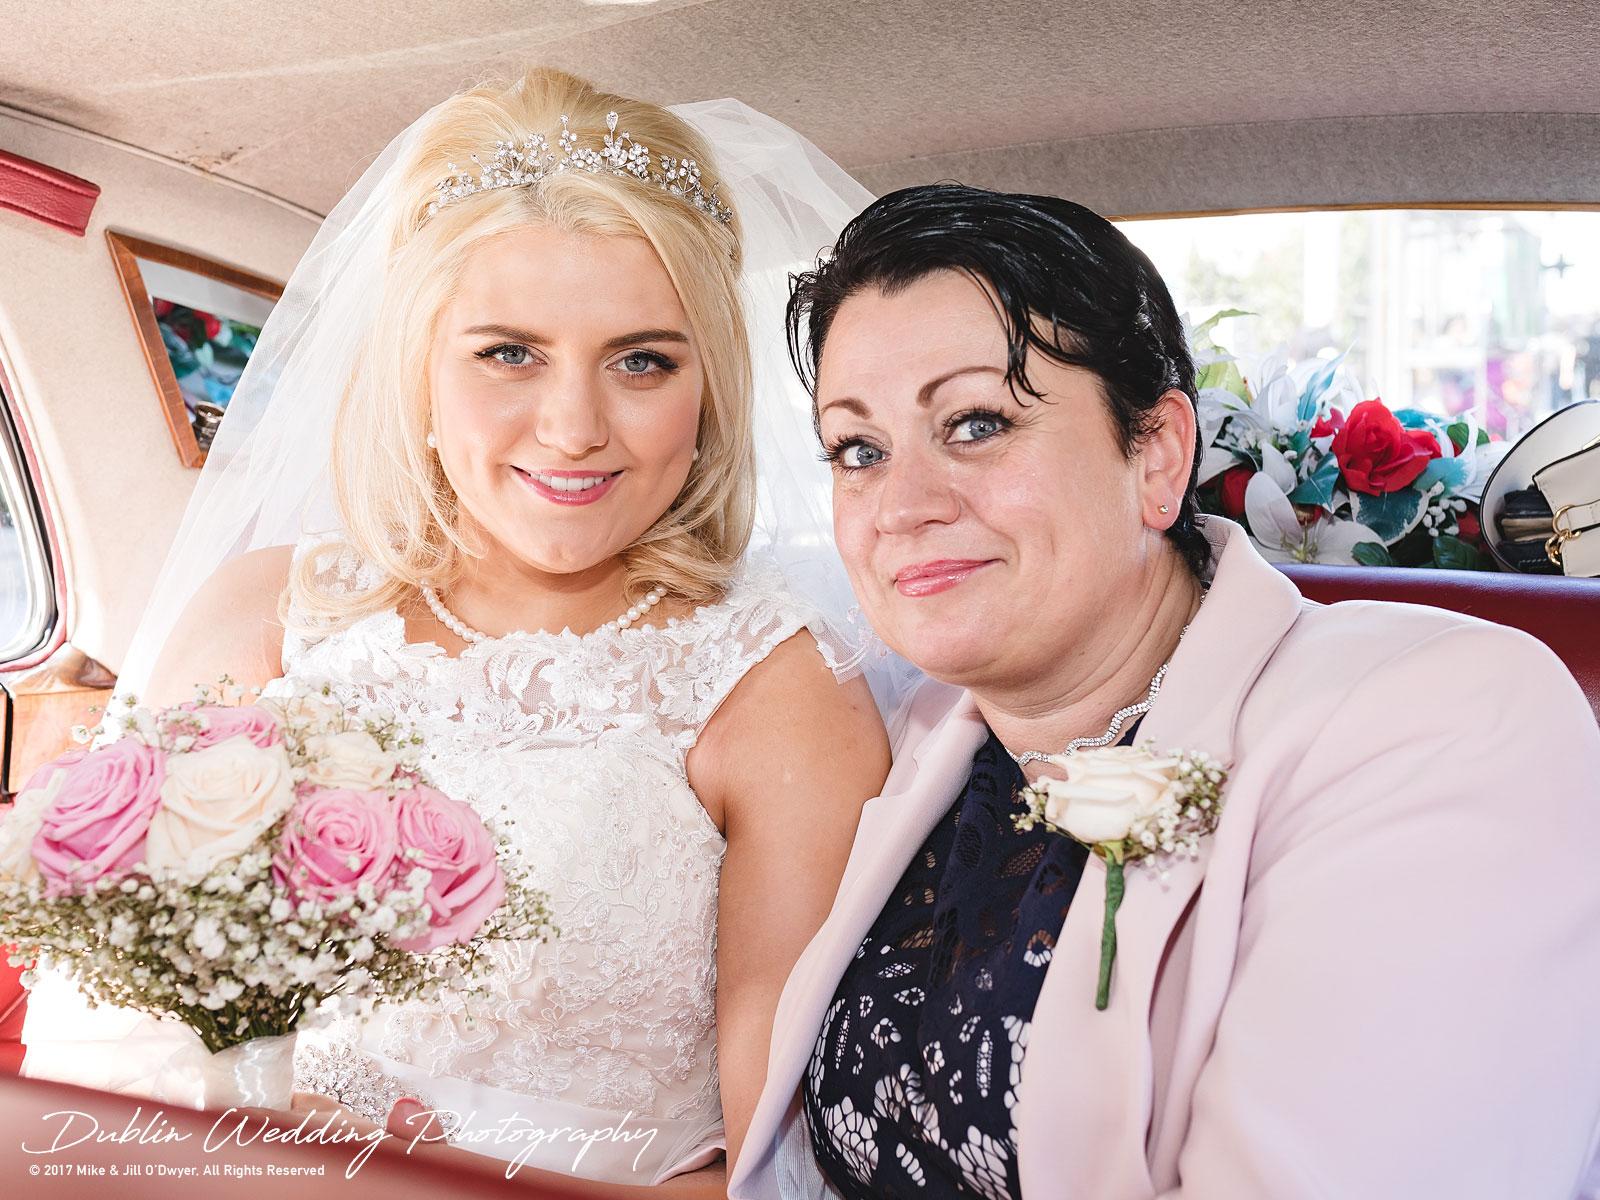 wedding-photographer-wicklow-glenview-hotel-KS016.jpg